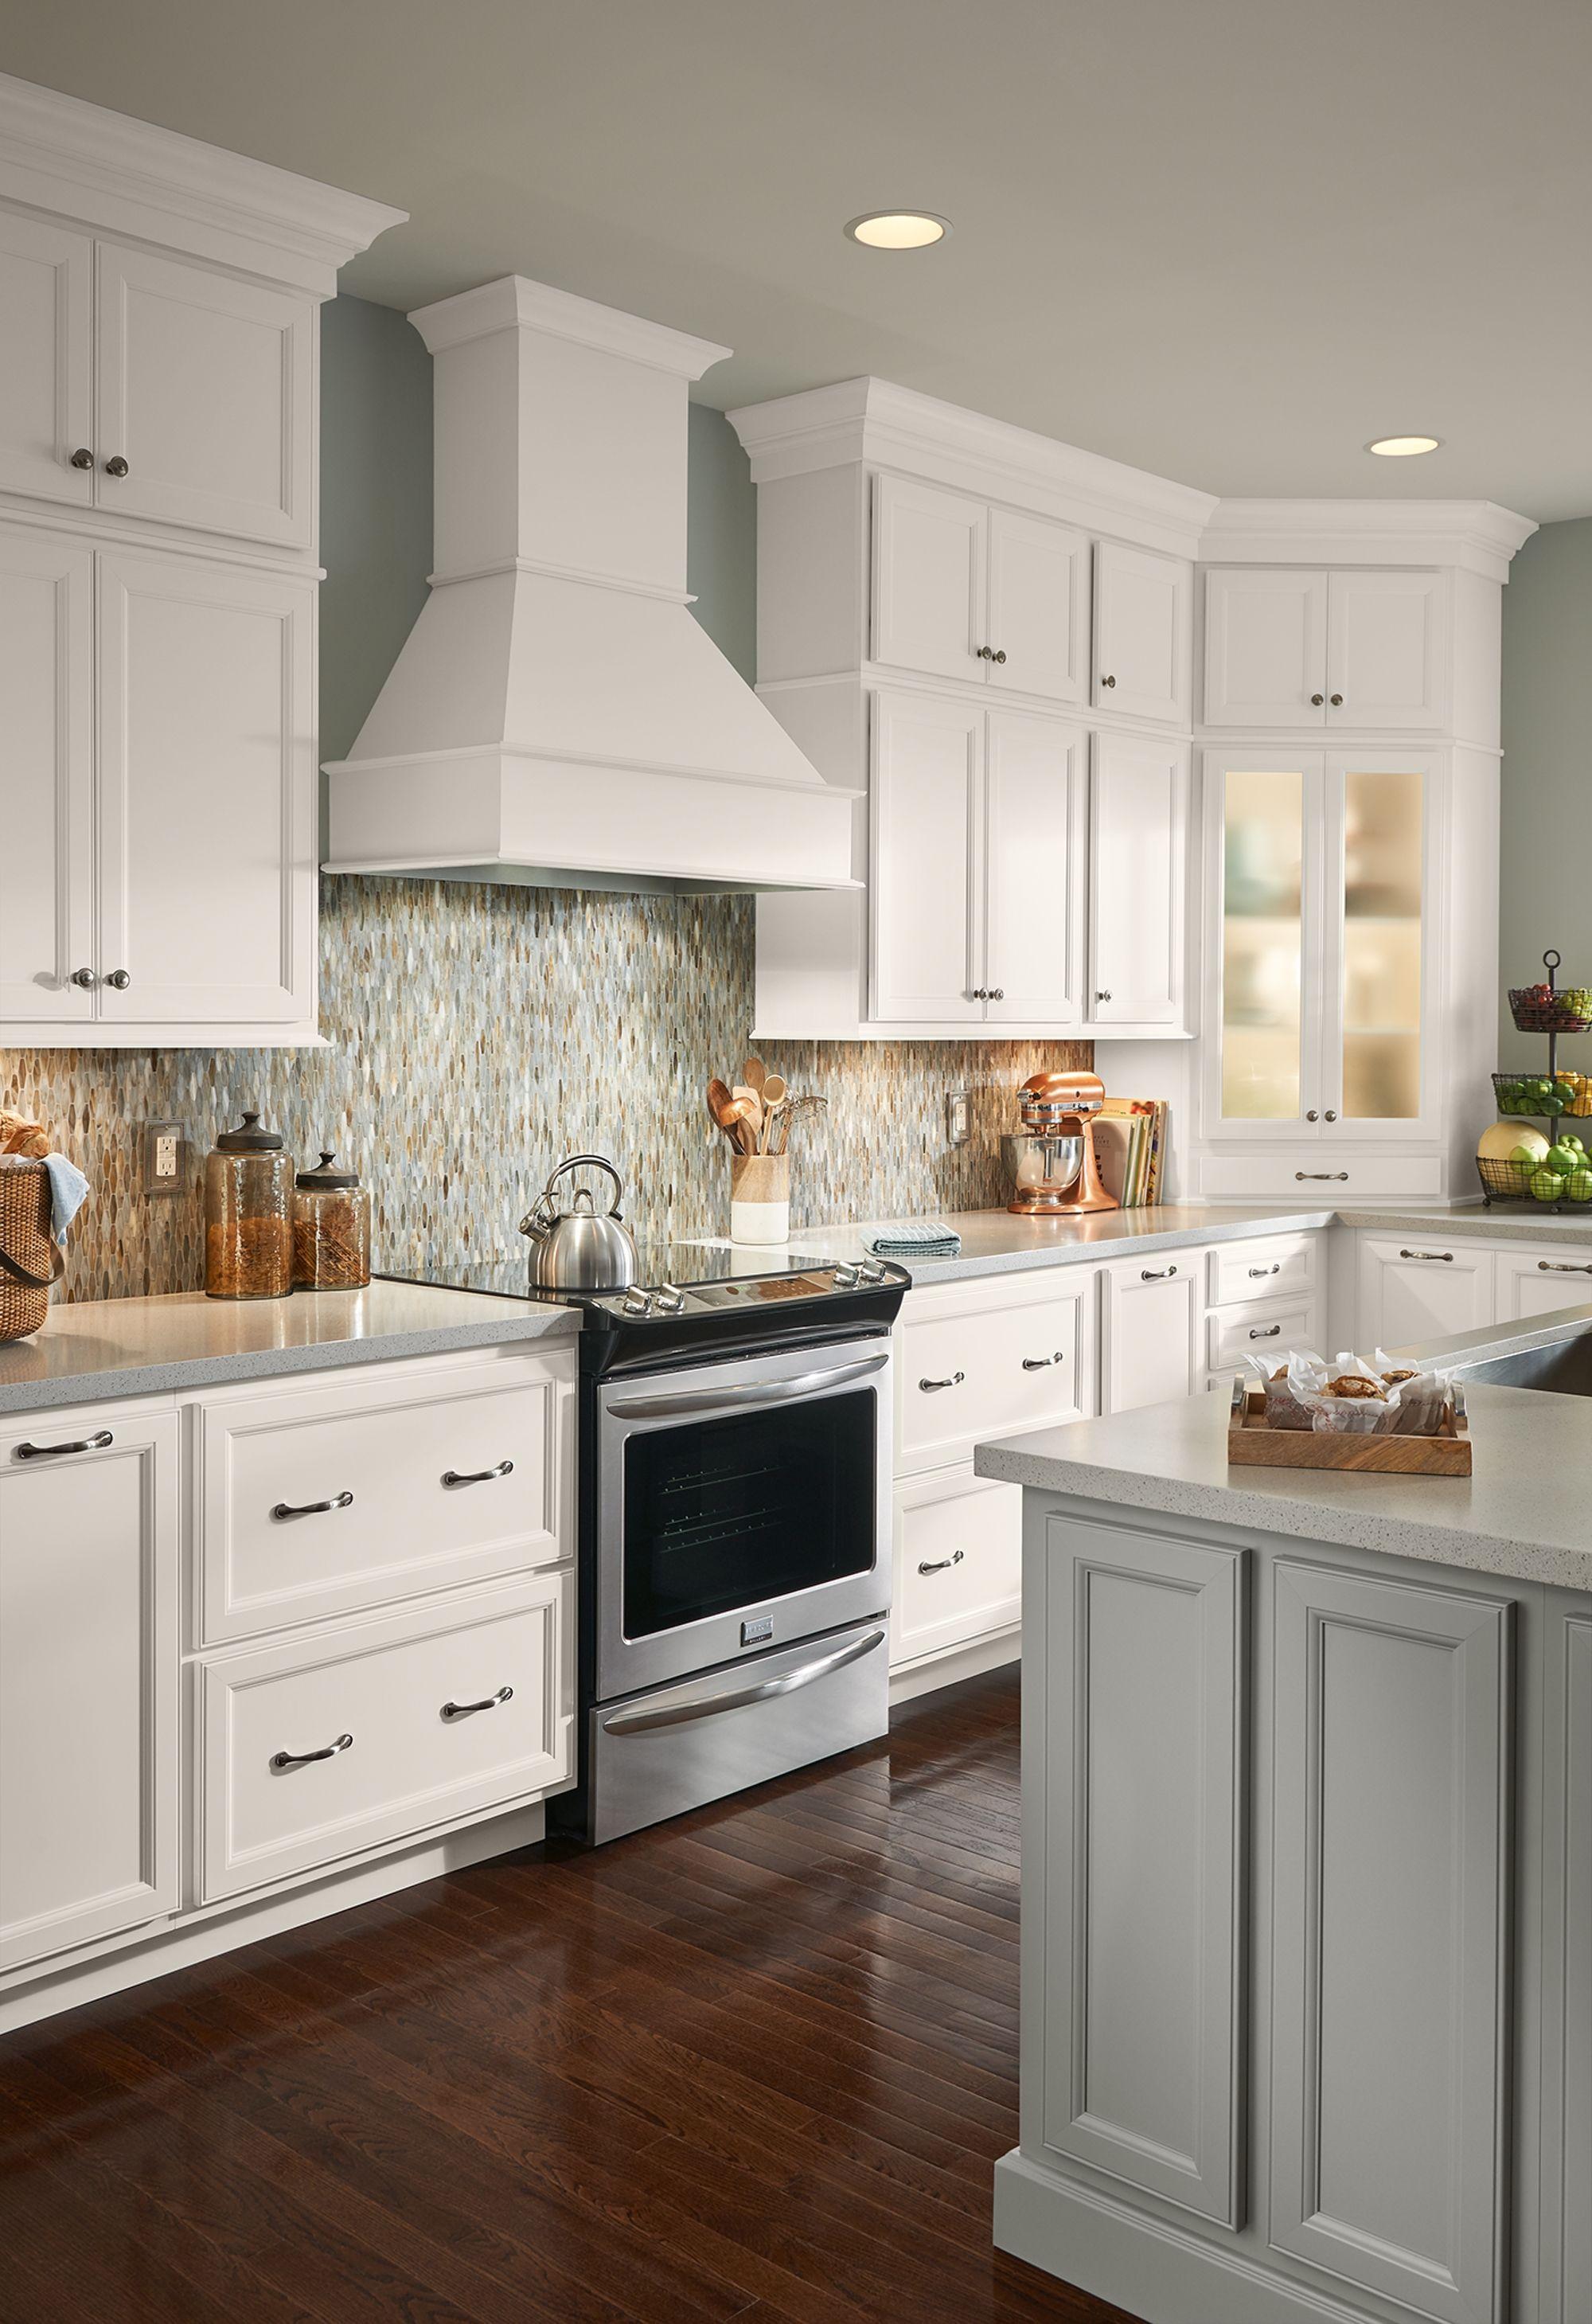 Home Depot Kitchen Remodel Cost in 2020 Semi custom